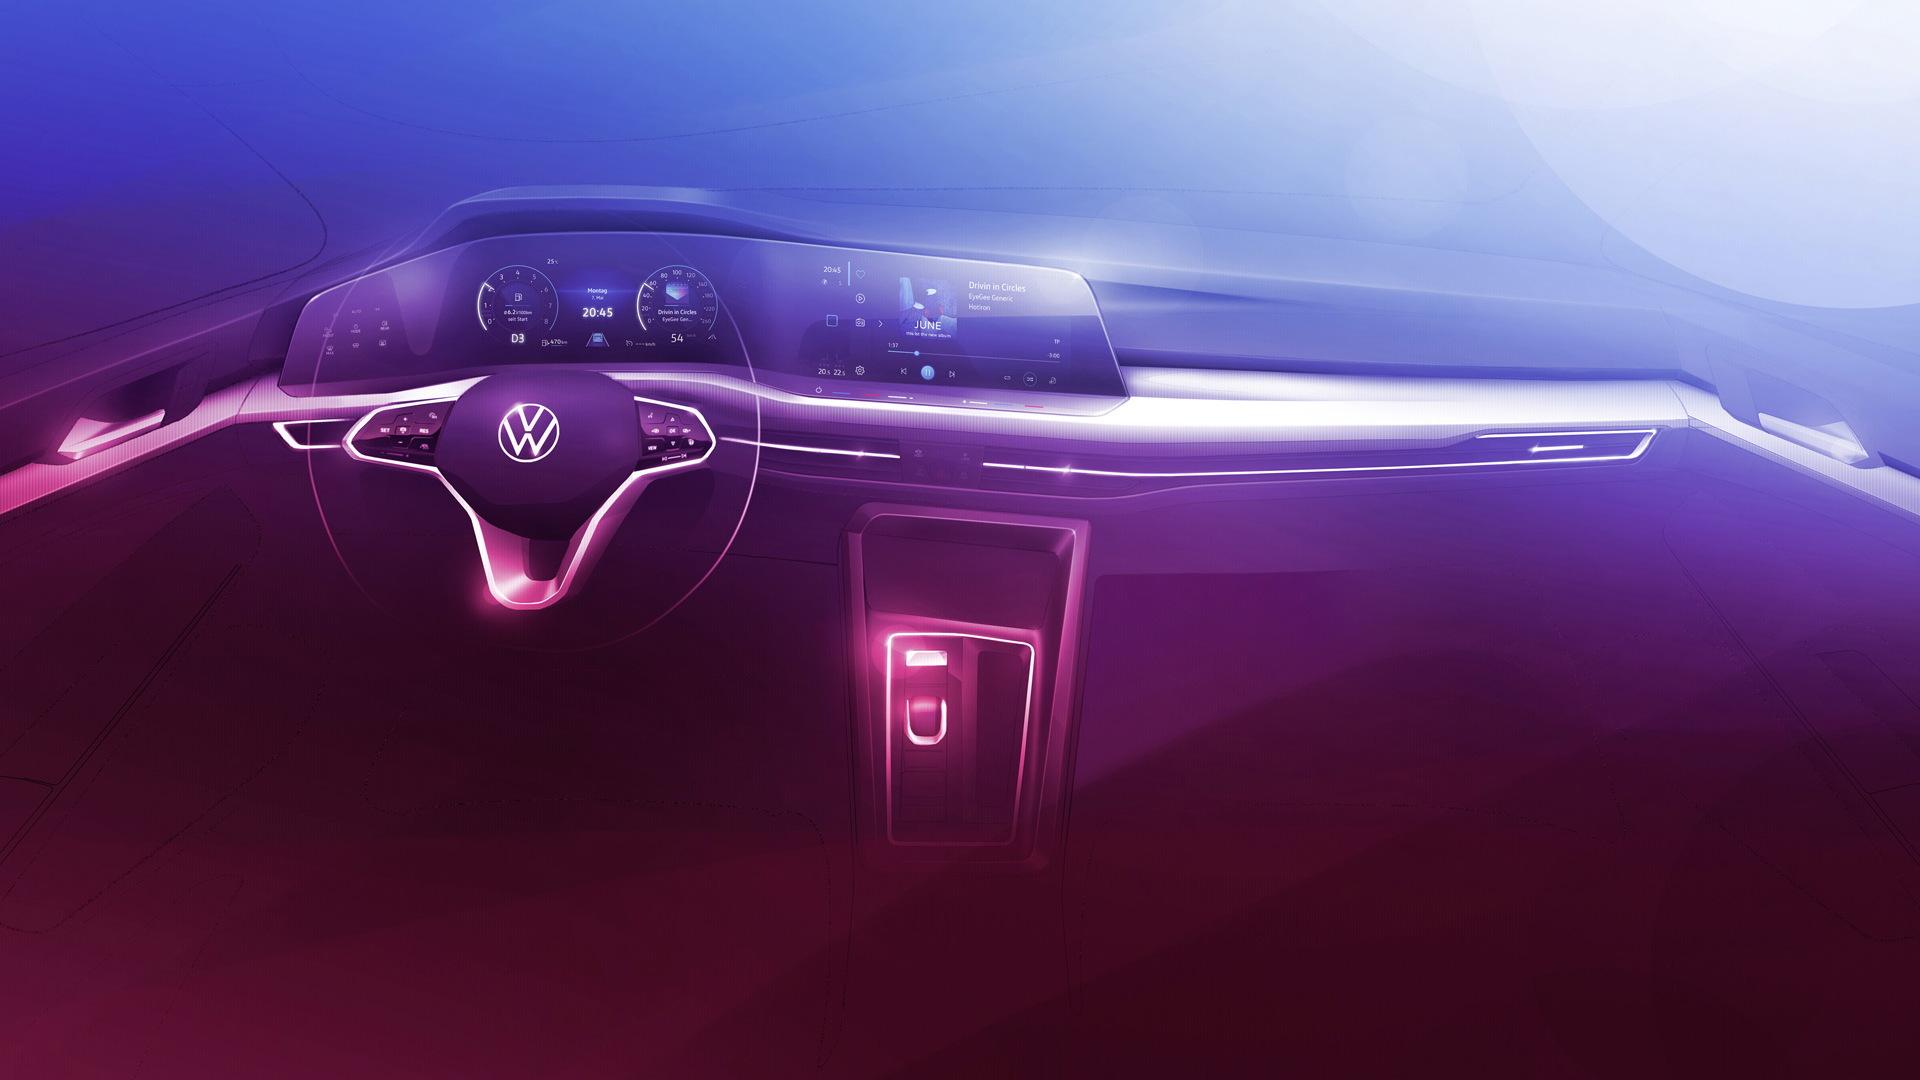 Teaser for new Volkswagen Golf debuting on October 24, 2019